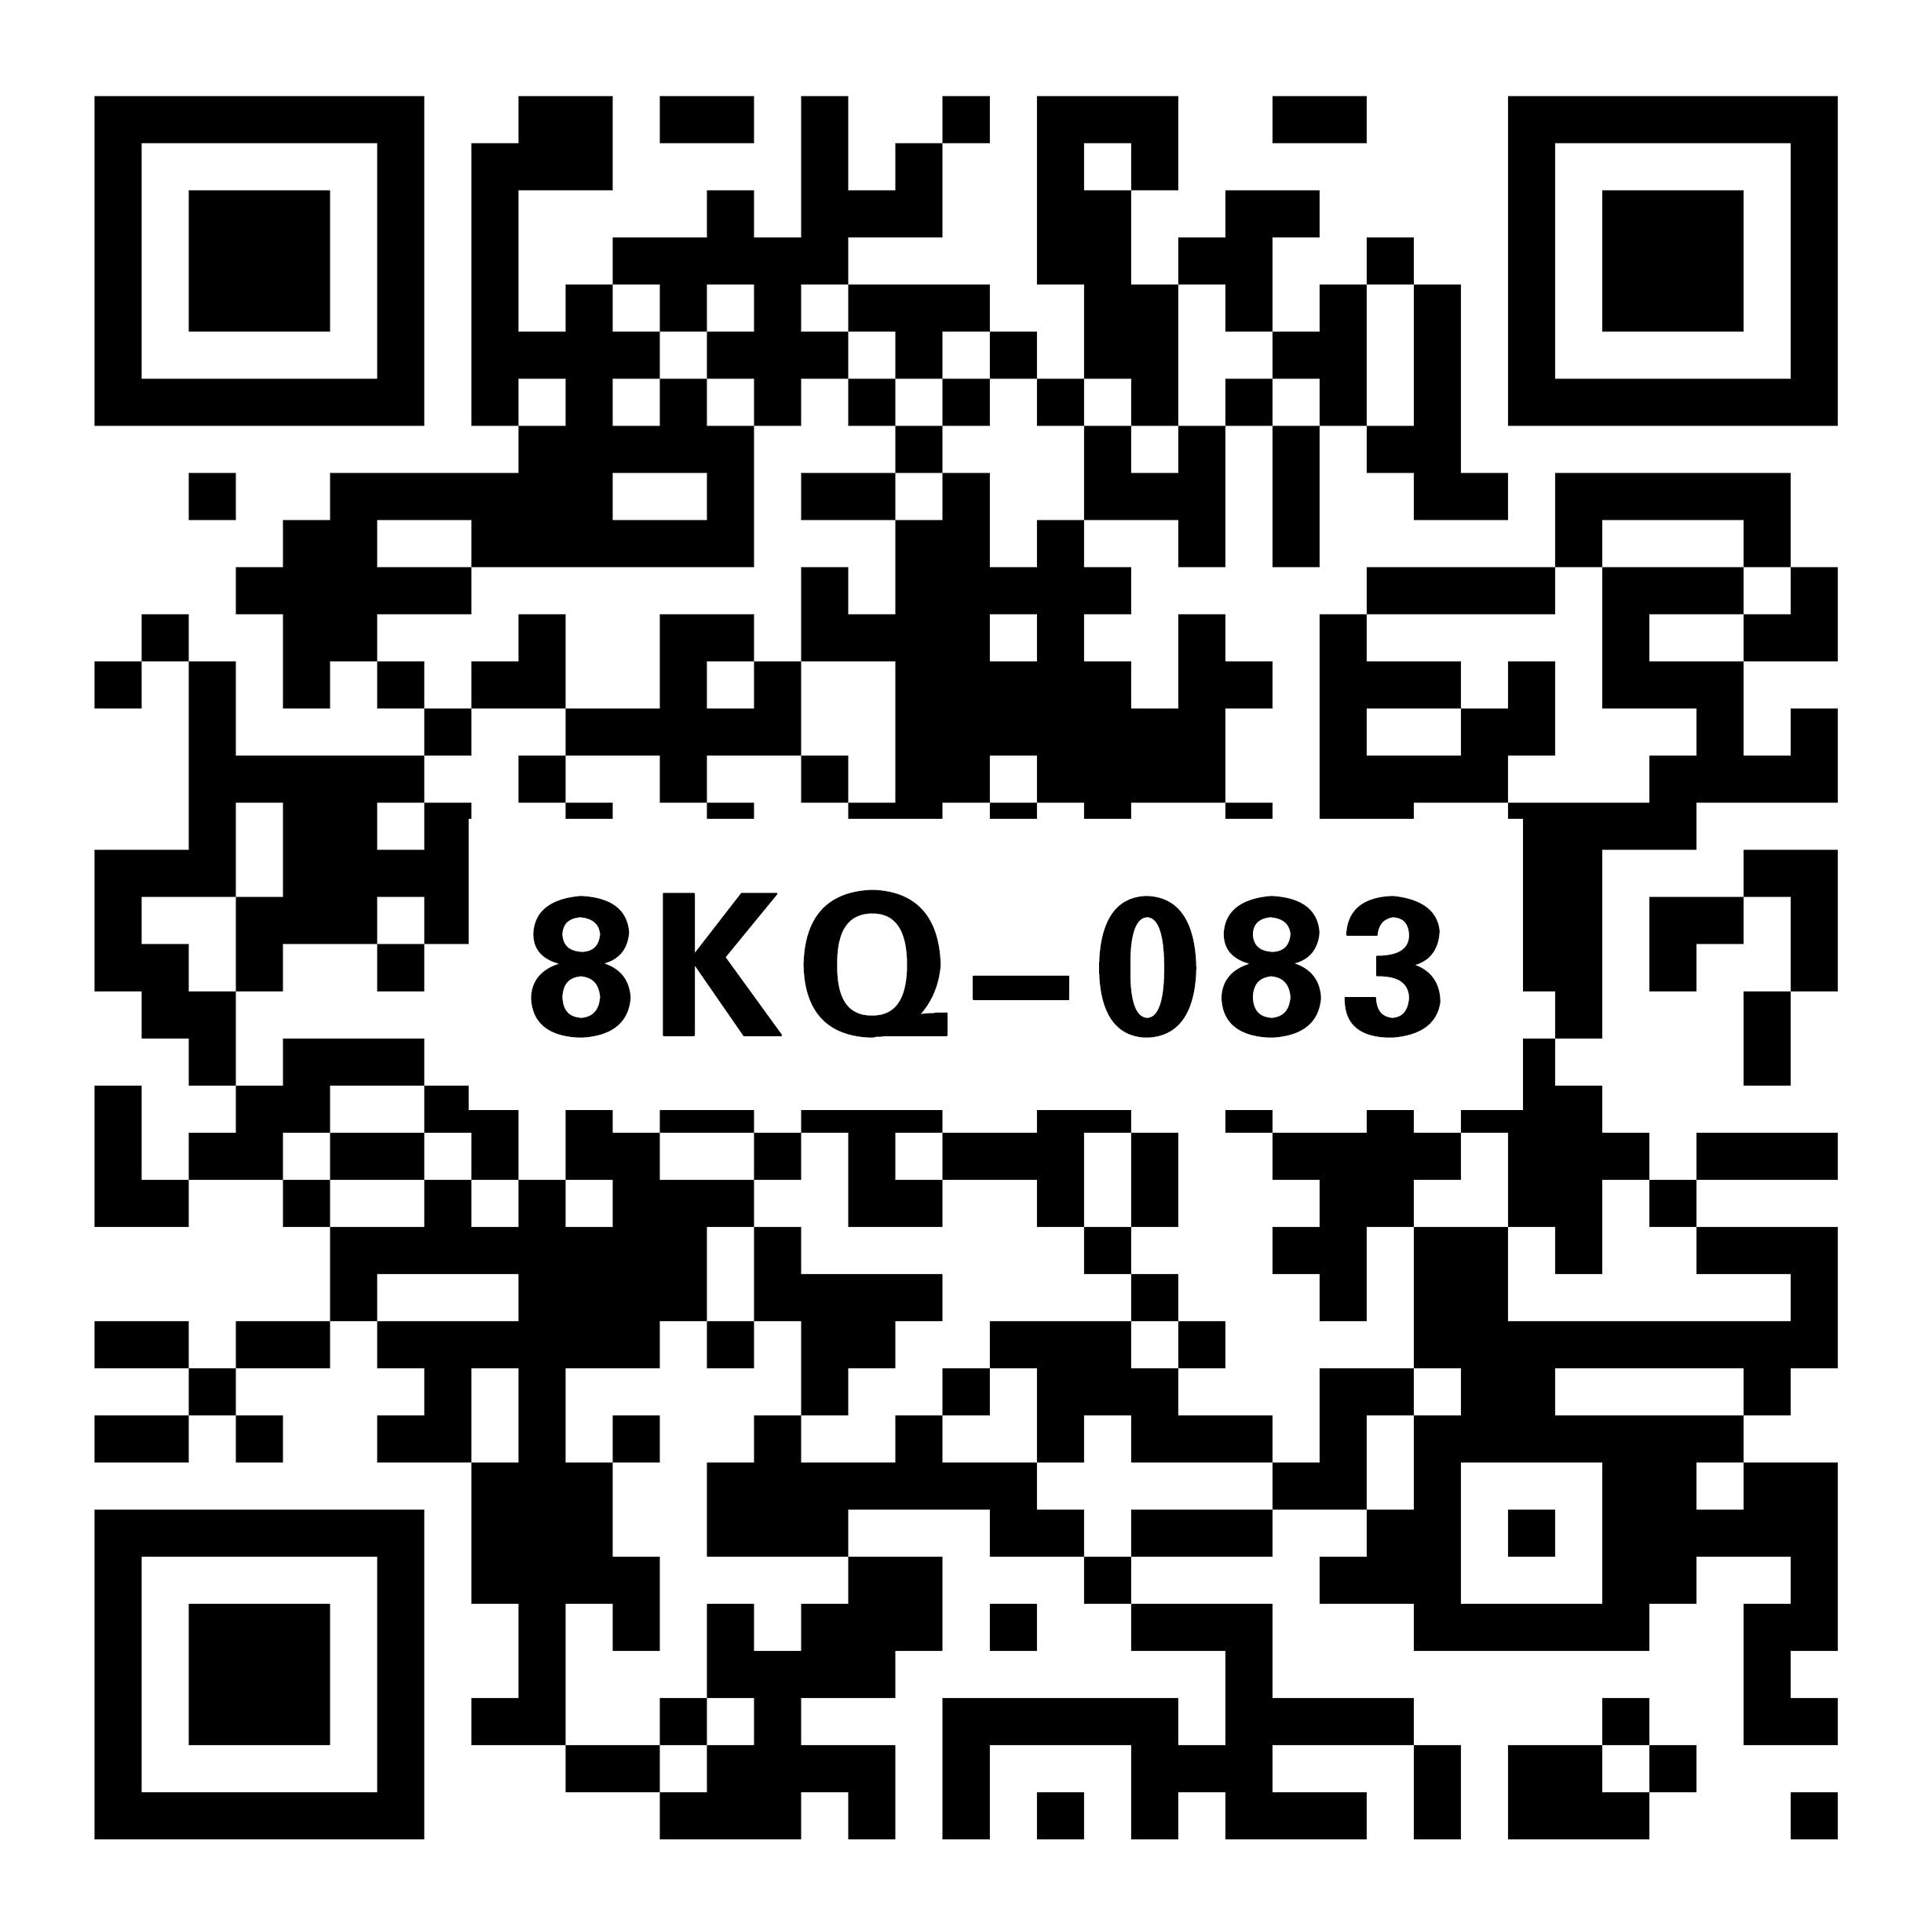 8KQ-083